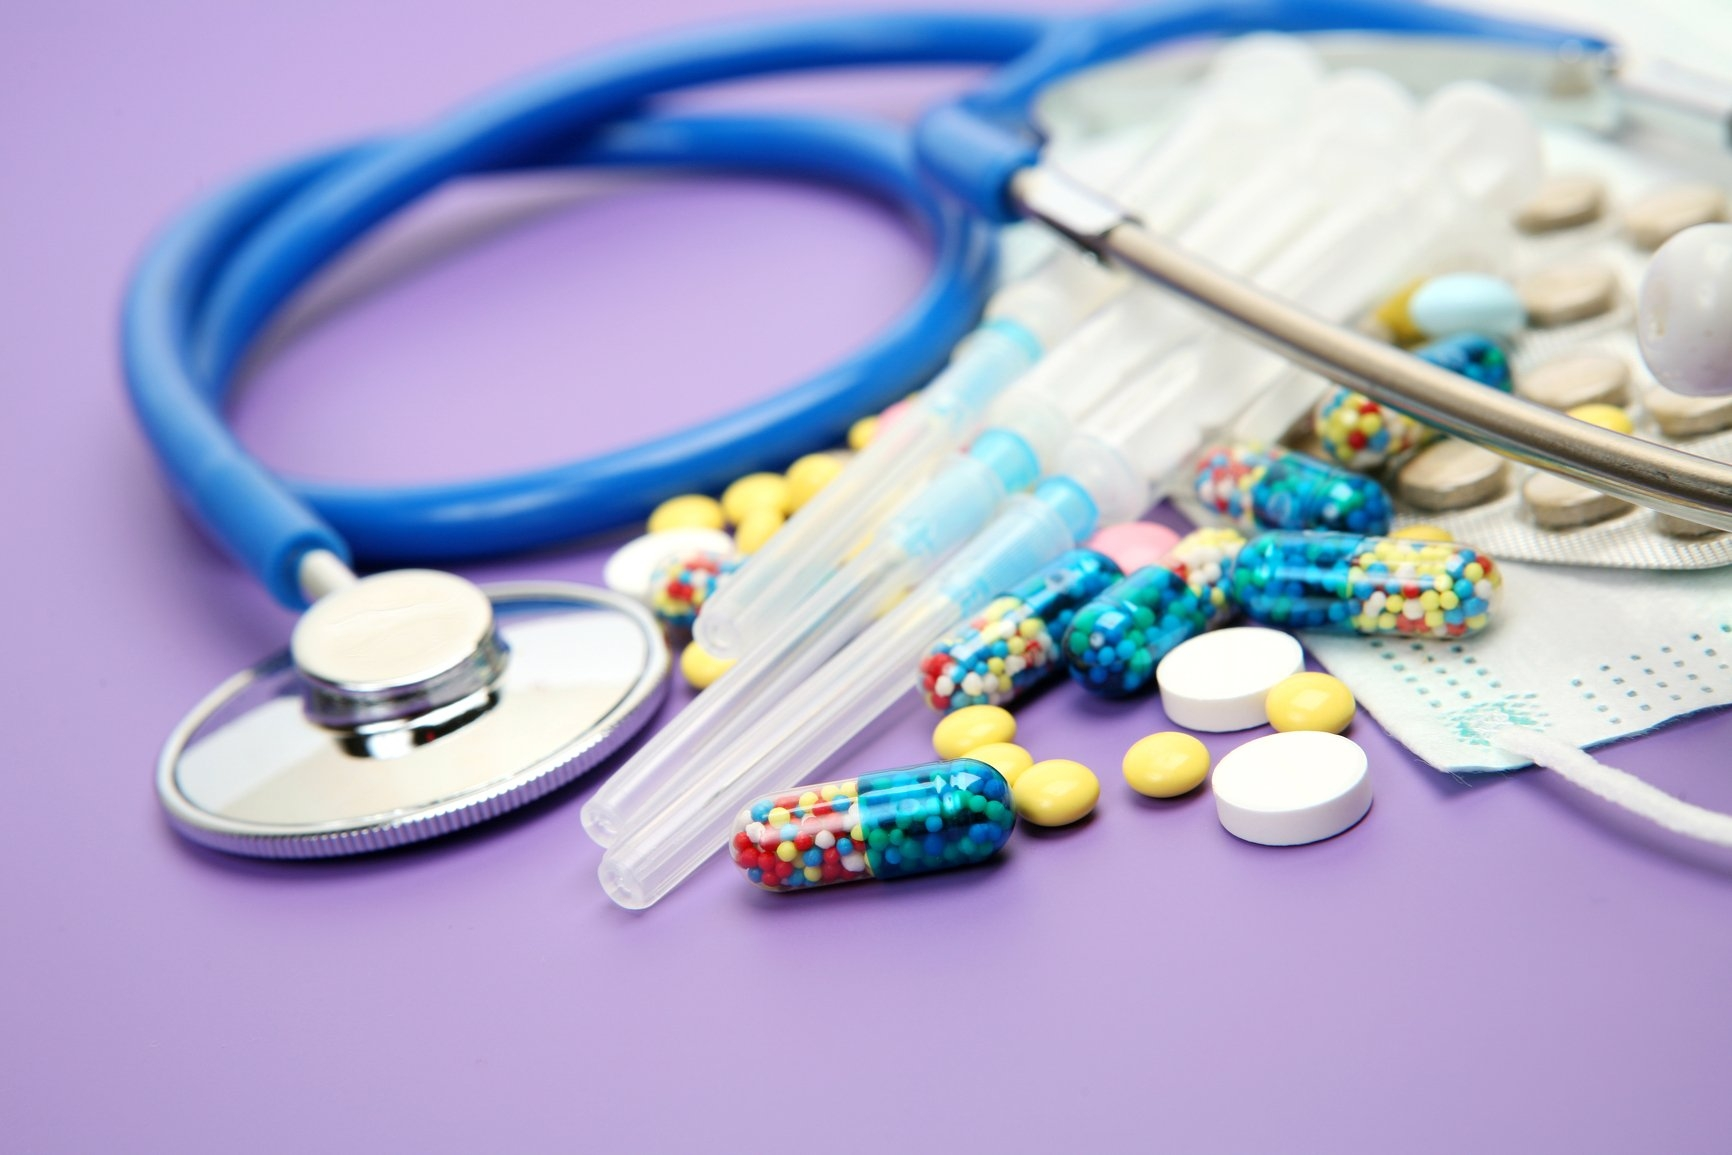 Лекарства оптом